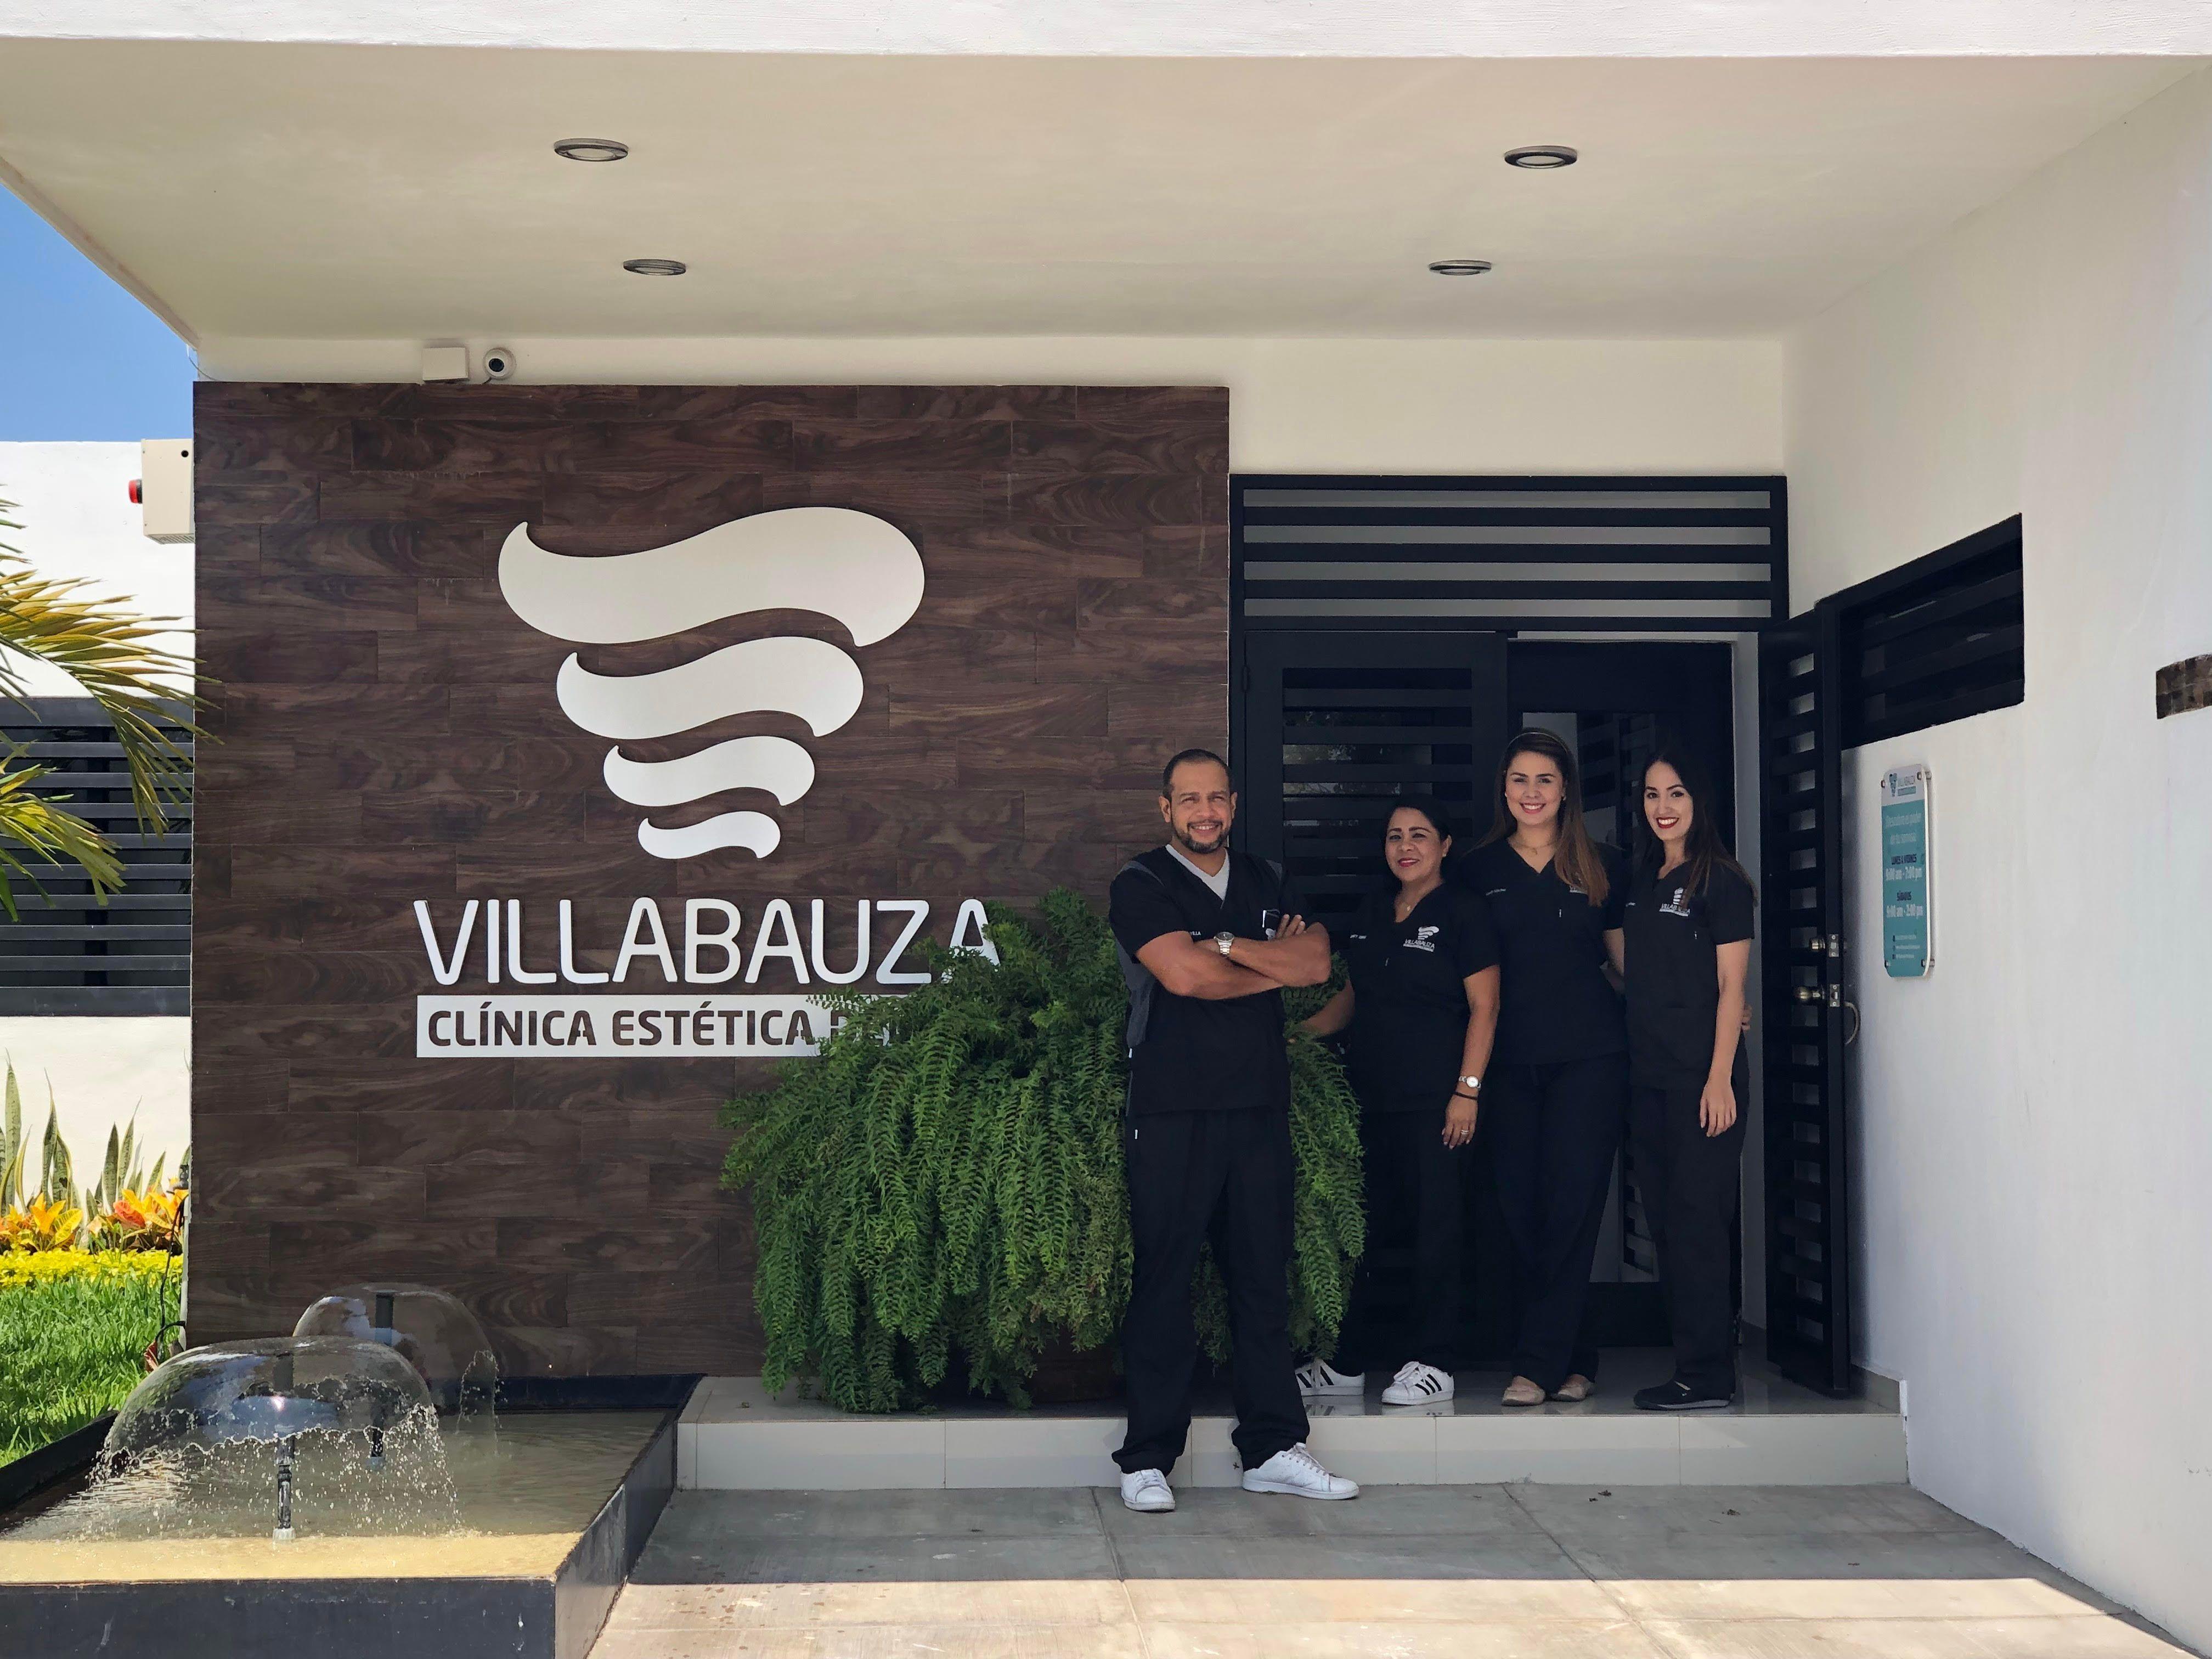 Villabauza Clinica Dental